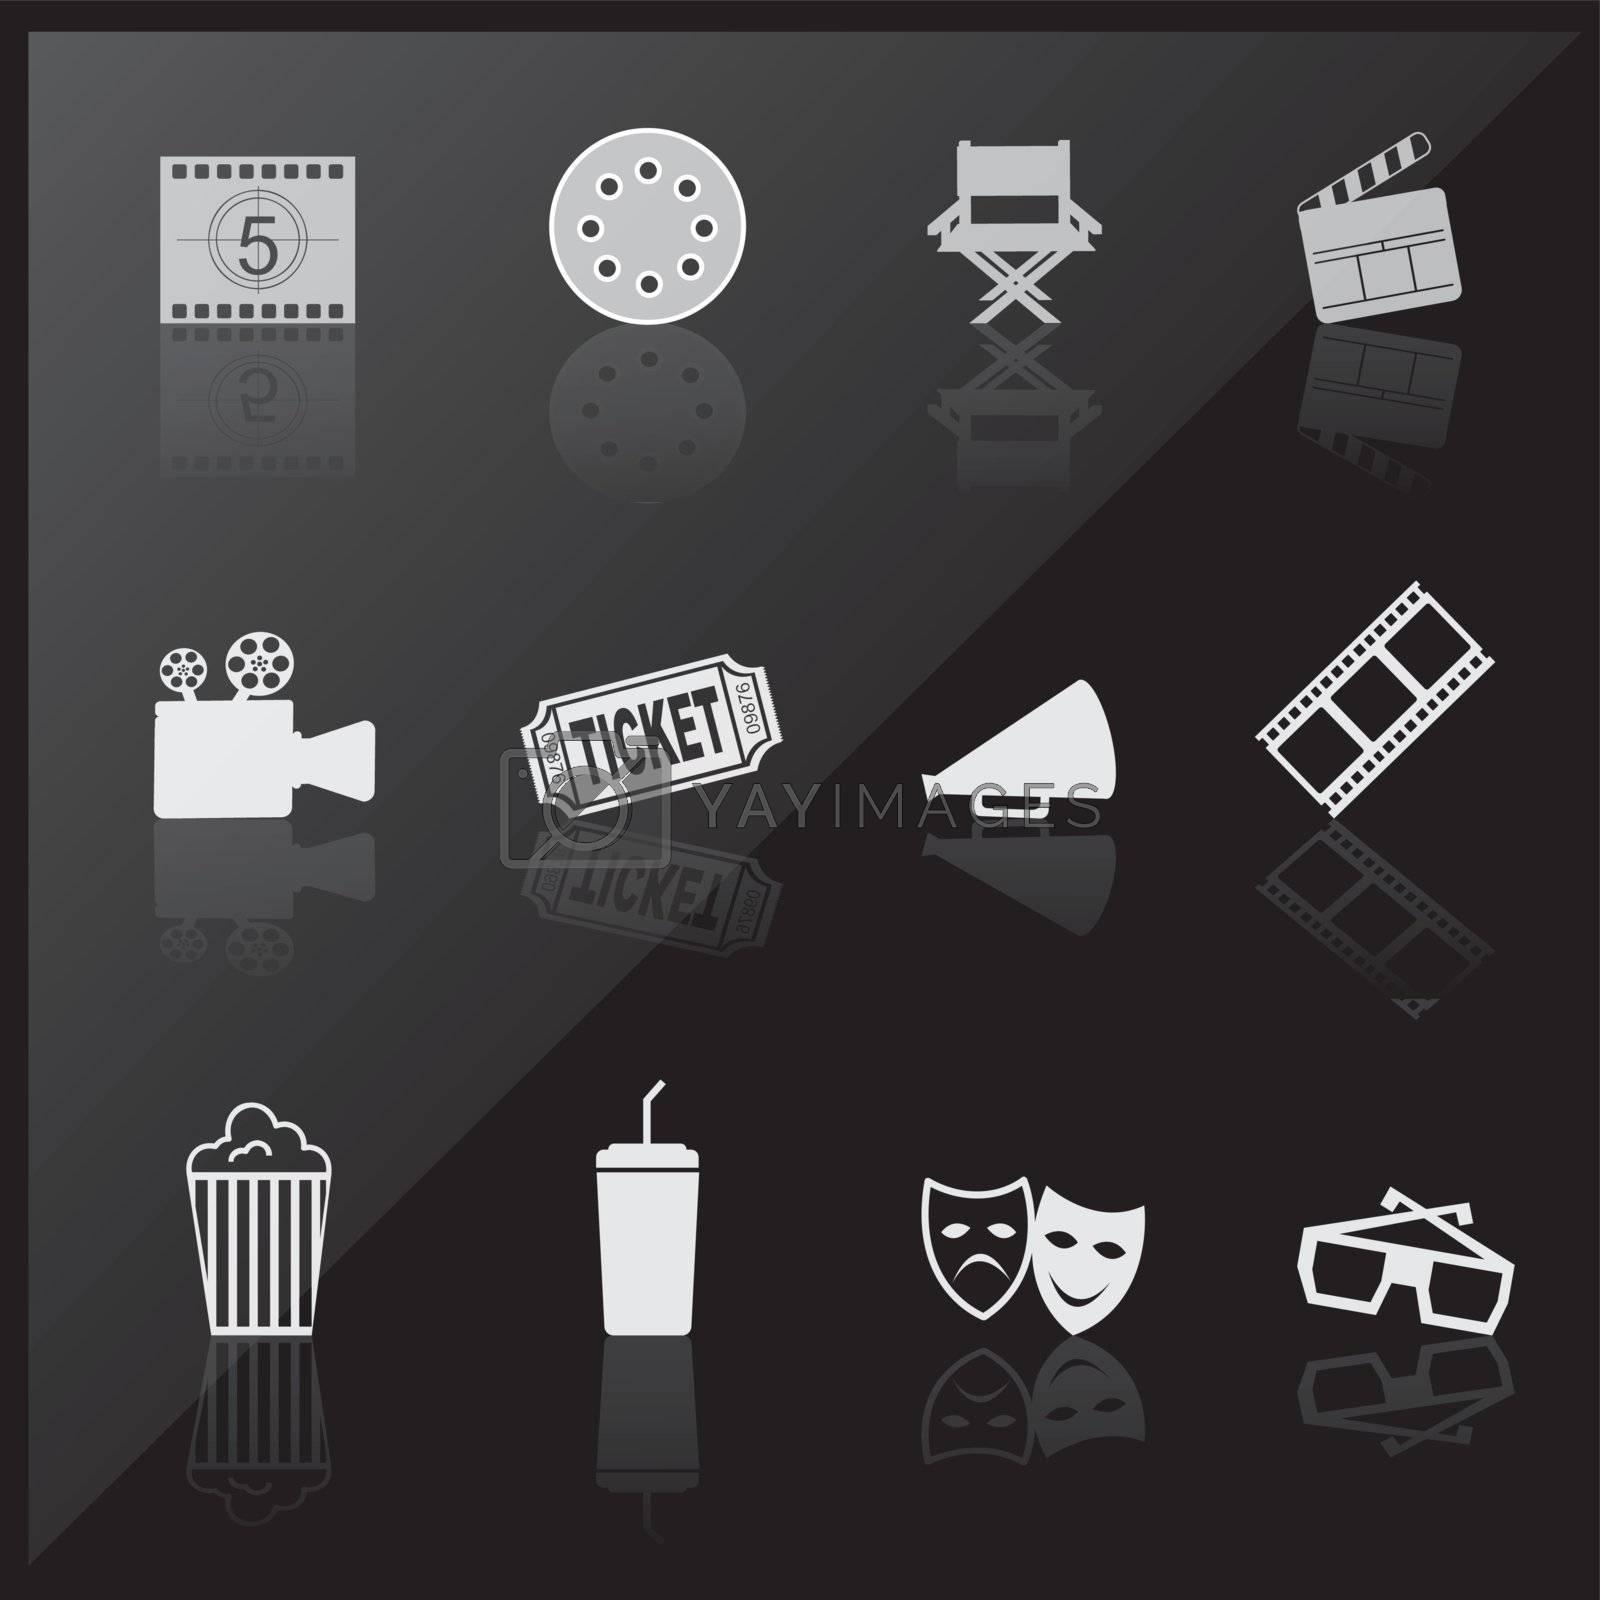 Cinema icons by yupiramos